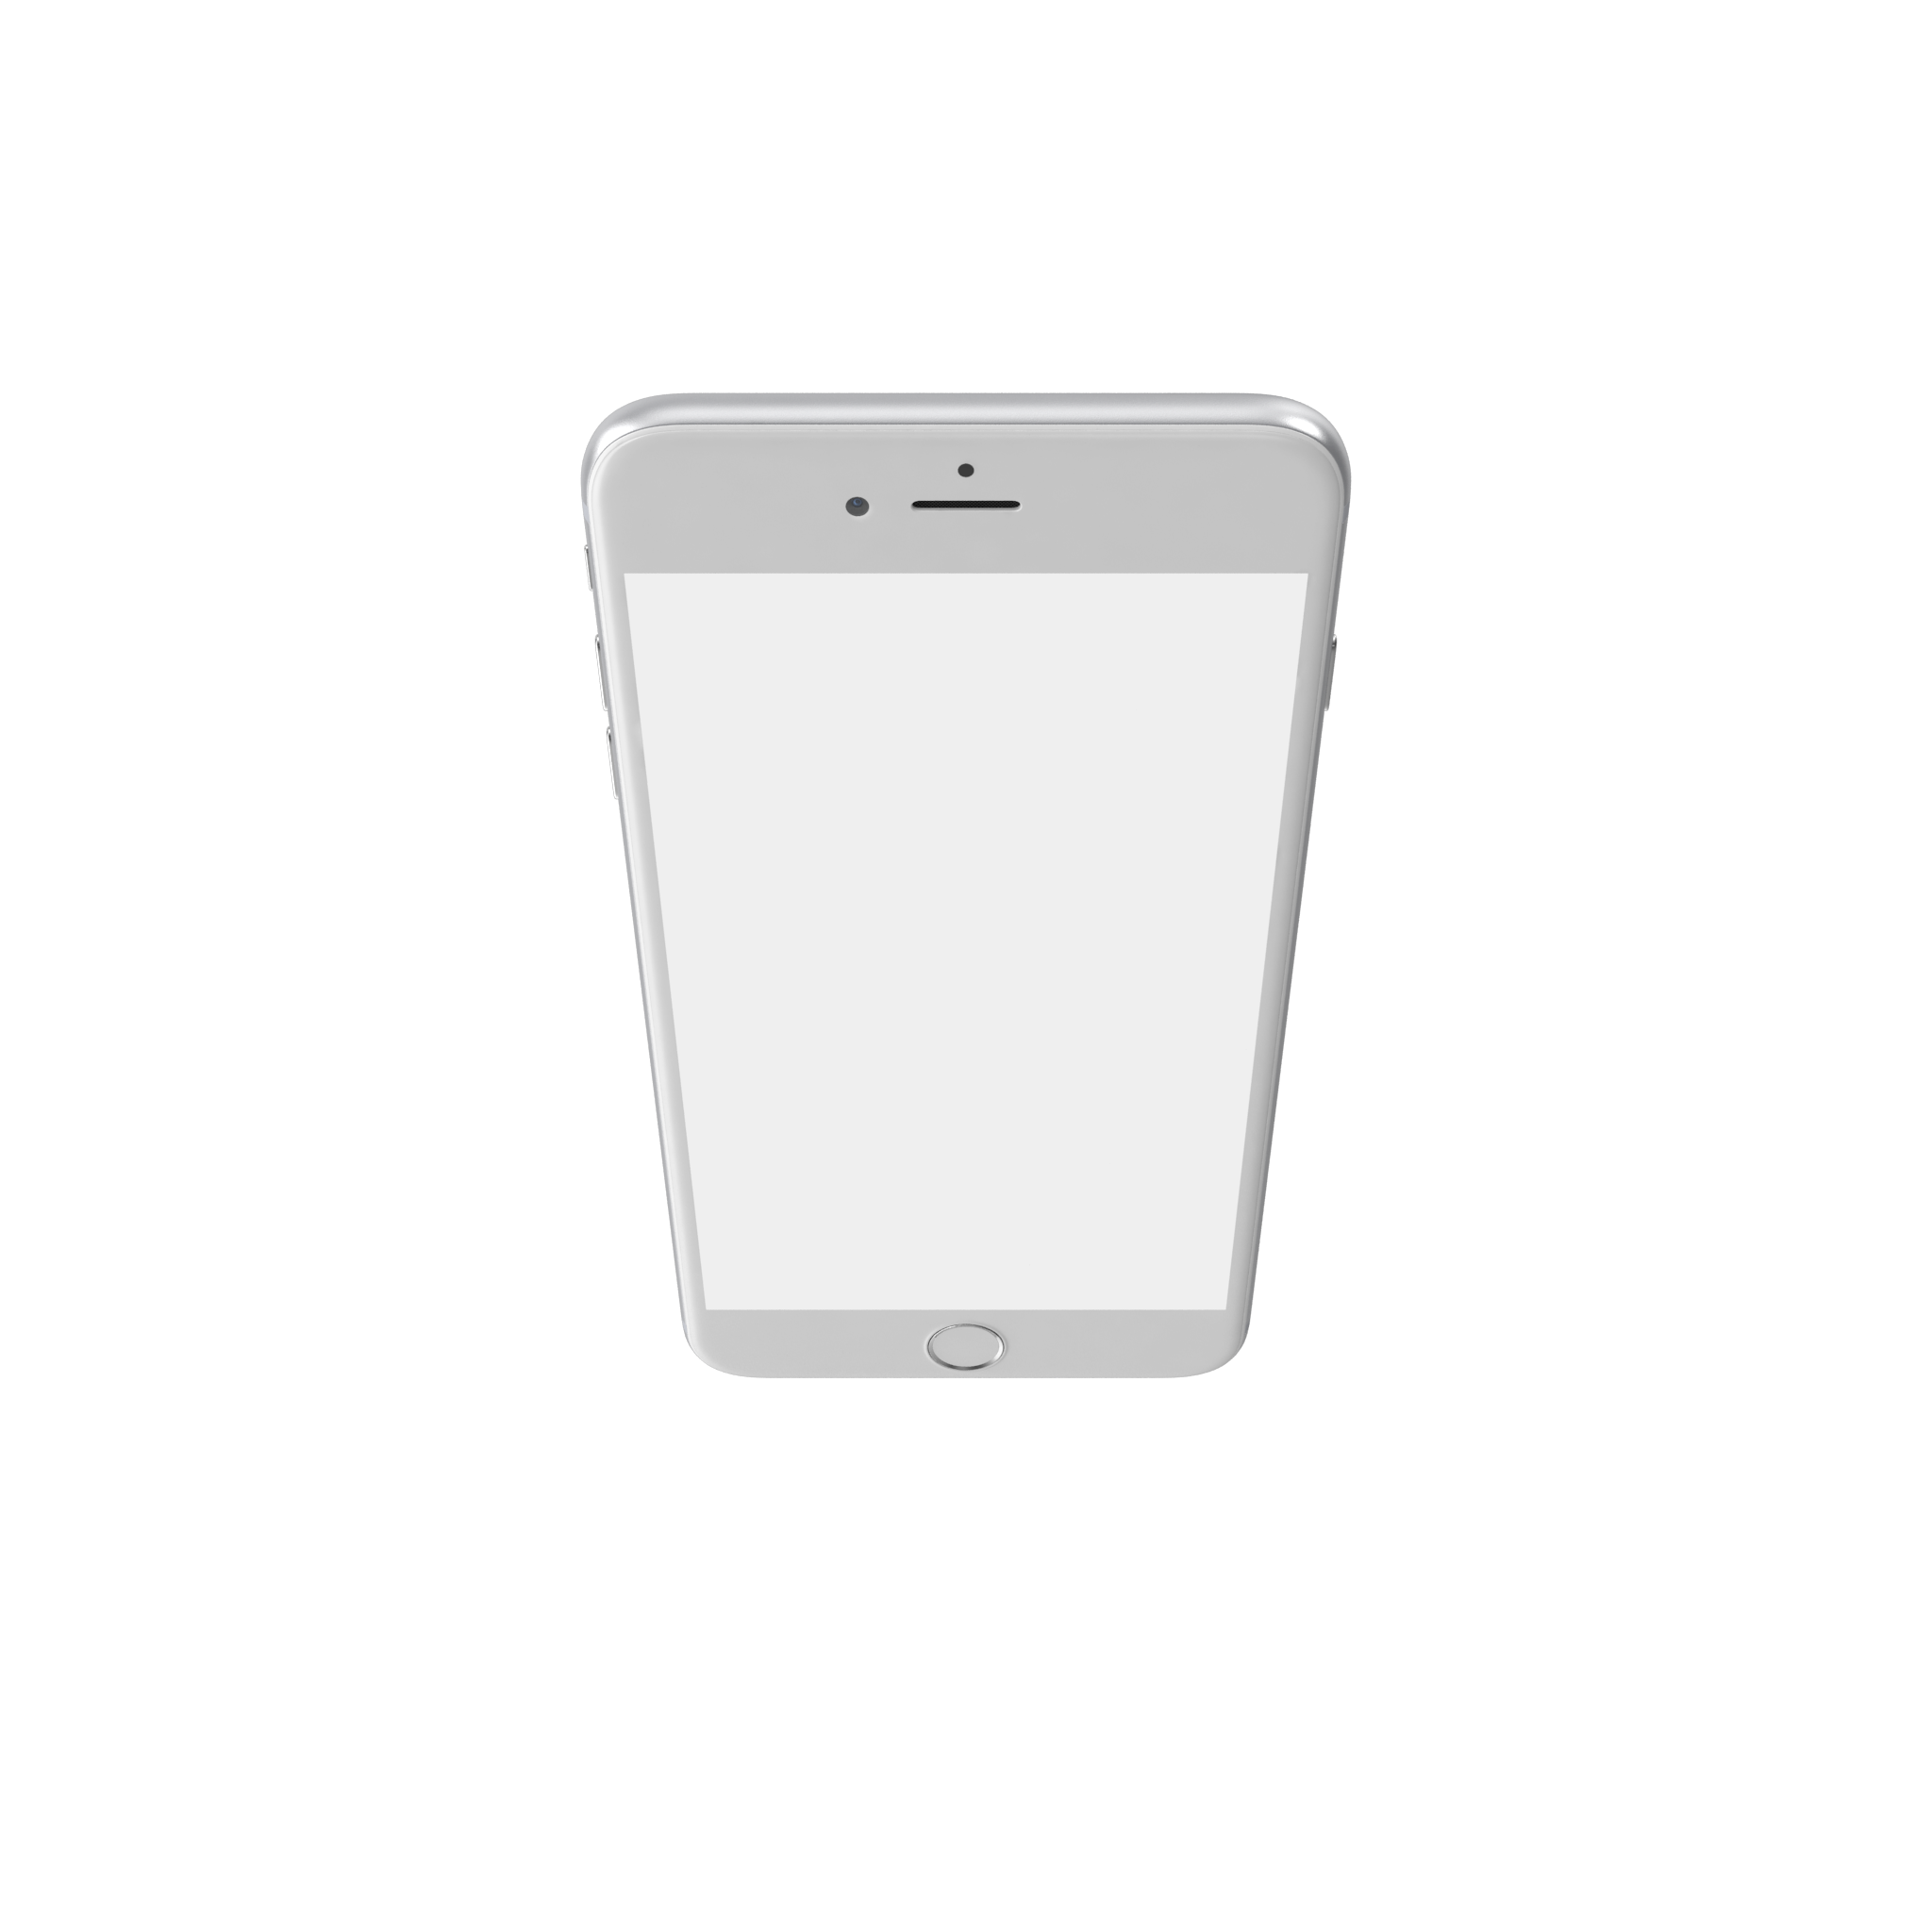 Iphone 6 Mockup Iphone Iphone Mockup Ipad Mockup